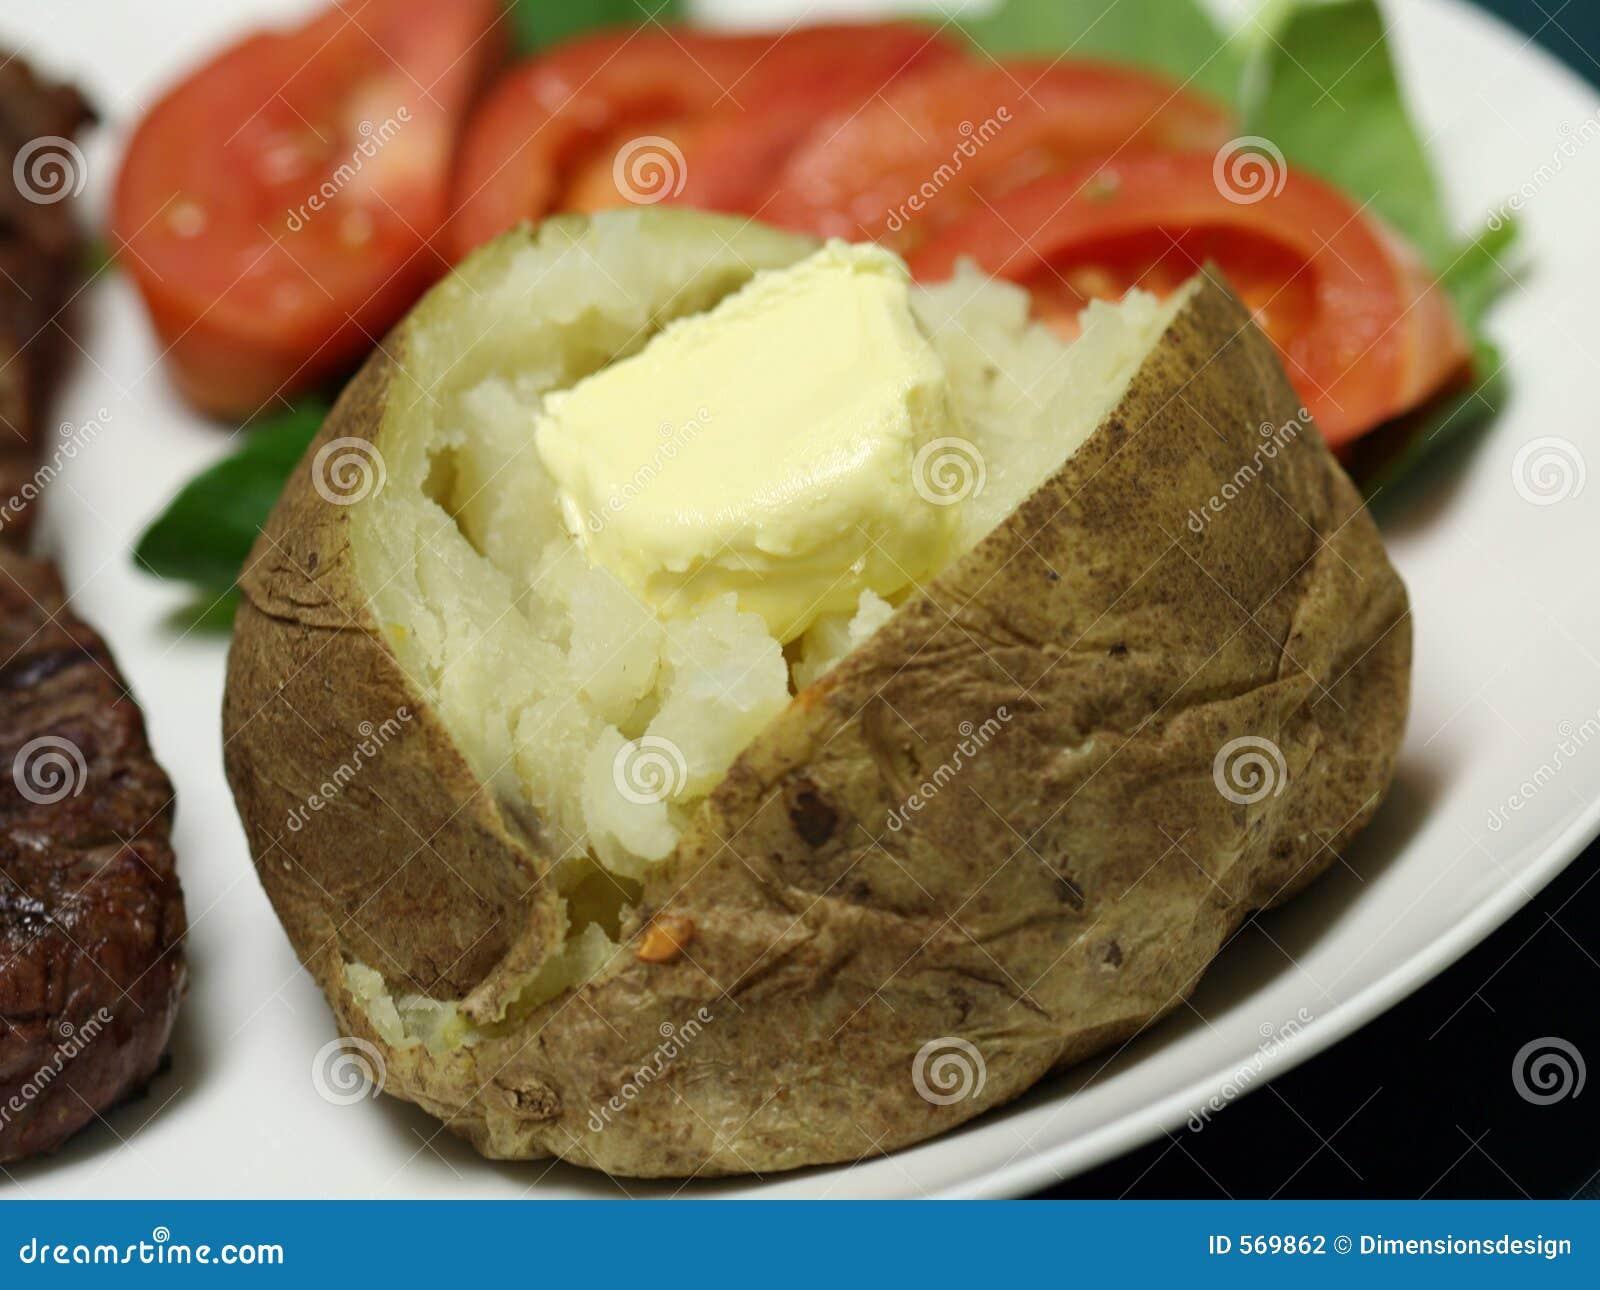 Baked Potato close up